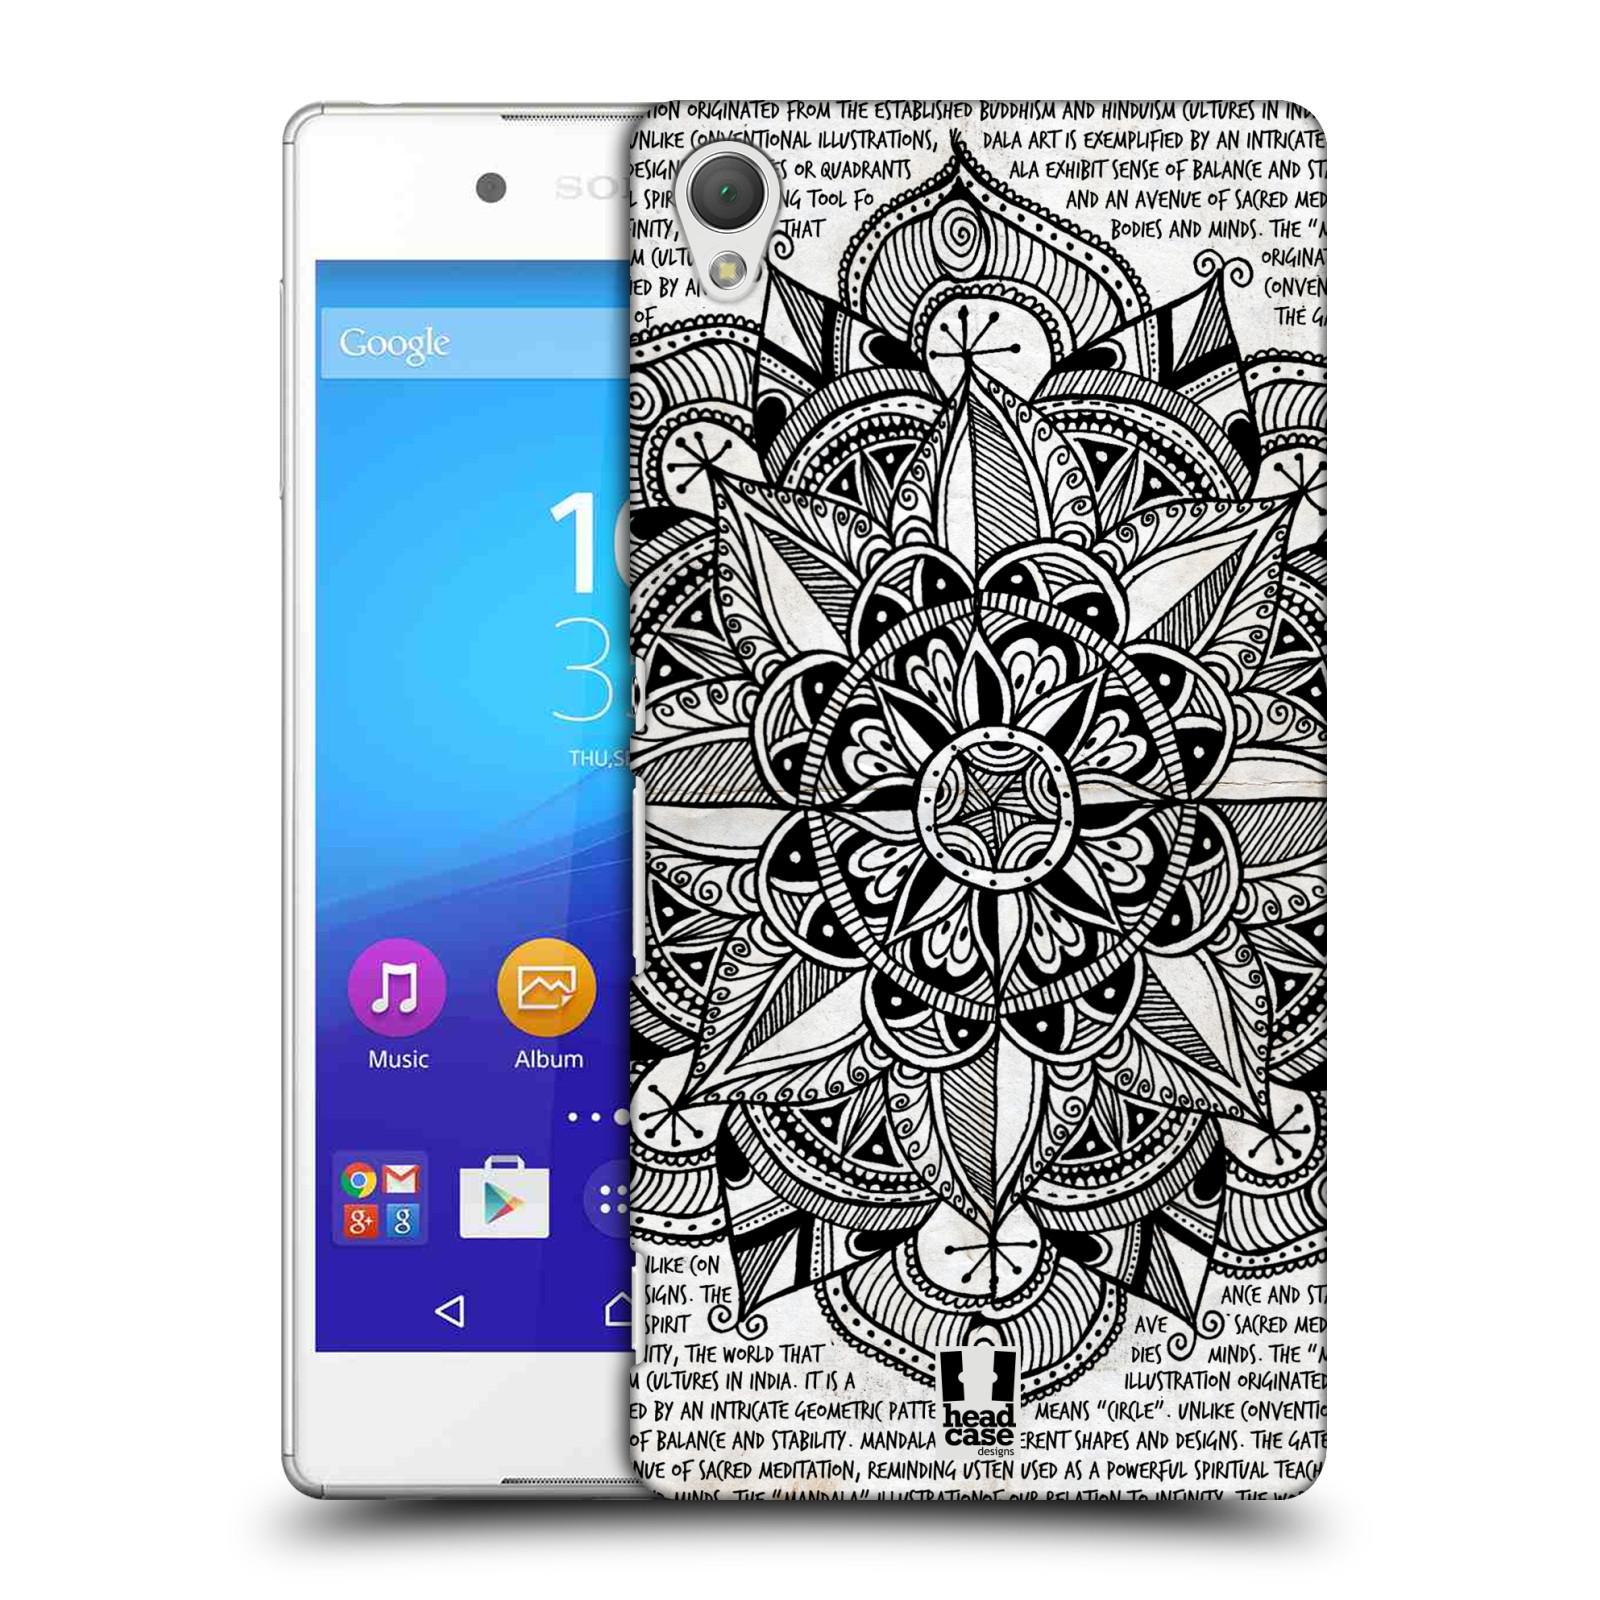 Plastové pouzdro na mobil Sony Xperia Z3+ (Plus) HEAD CASE Mandala Doodle Paper (Kryt či obal na mobilní telefon Sony Xperia Z3+ a Sony Xperia Z4 )